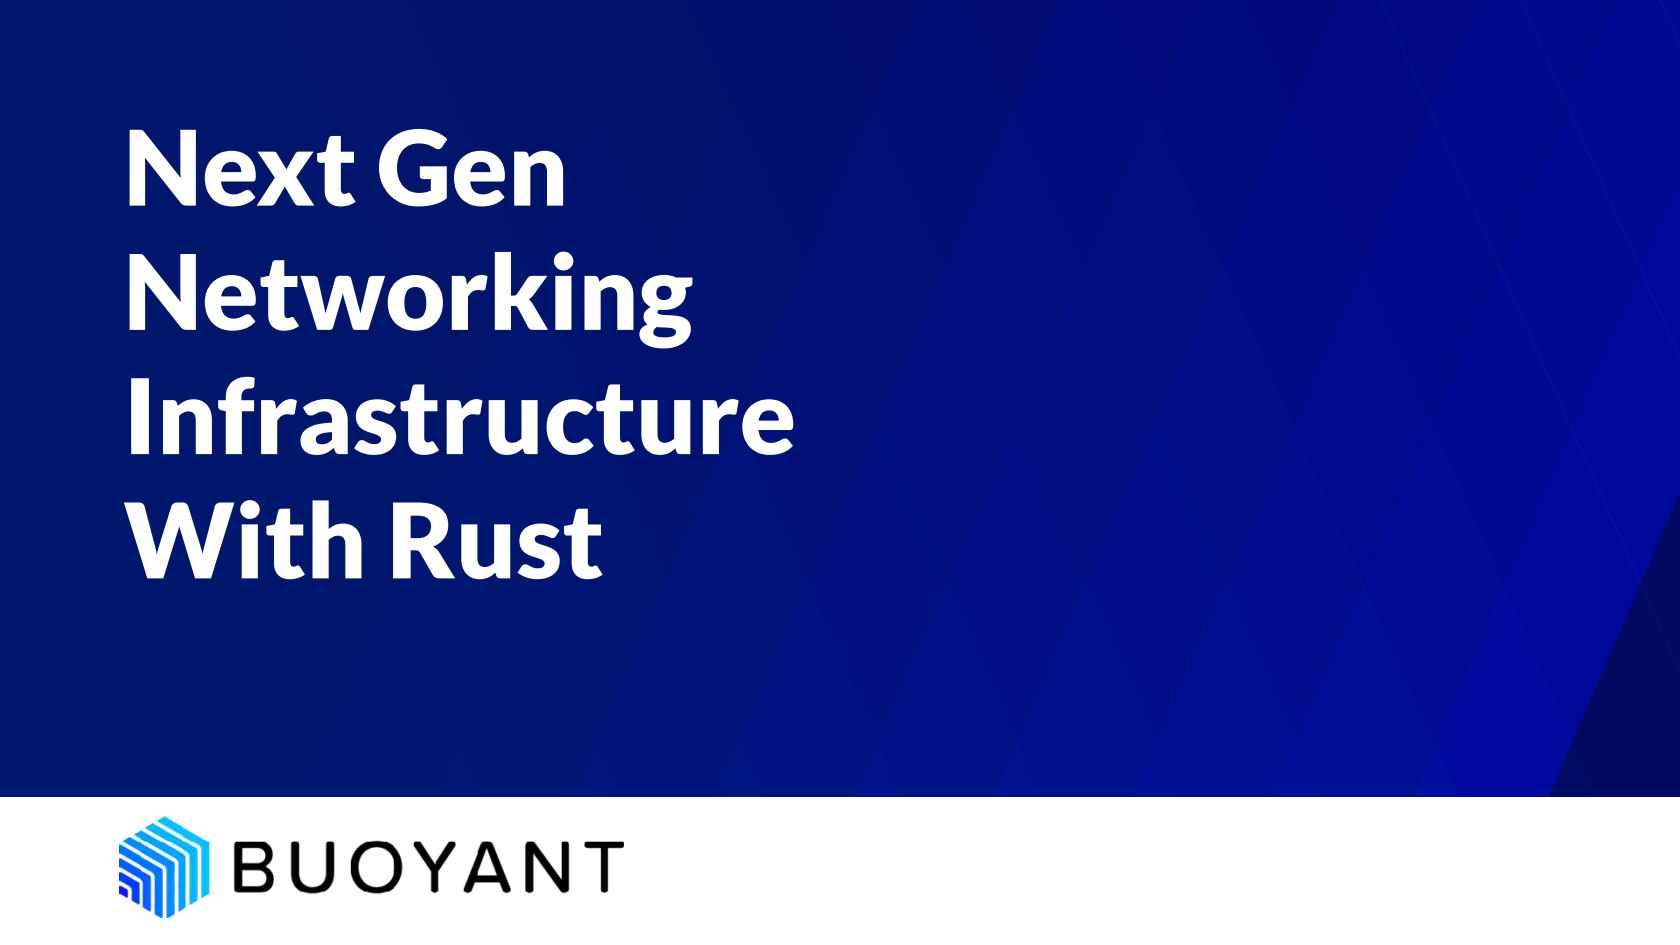 Next Gen Networking Infrastructure with Rust